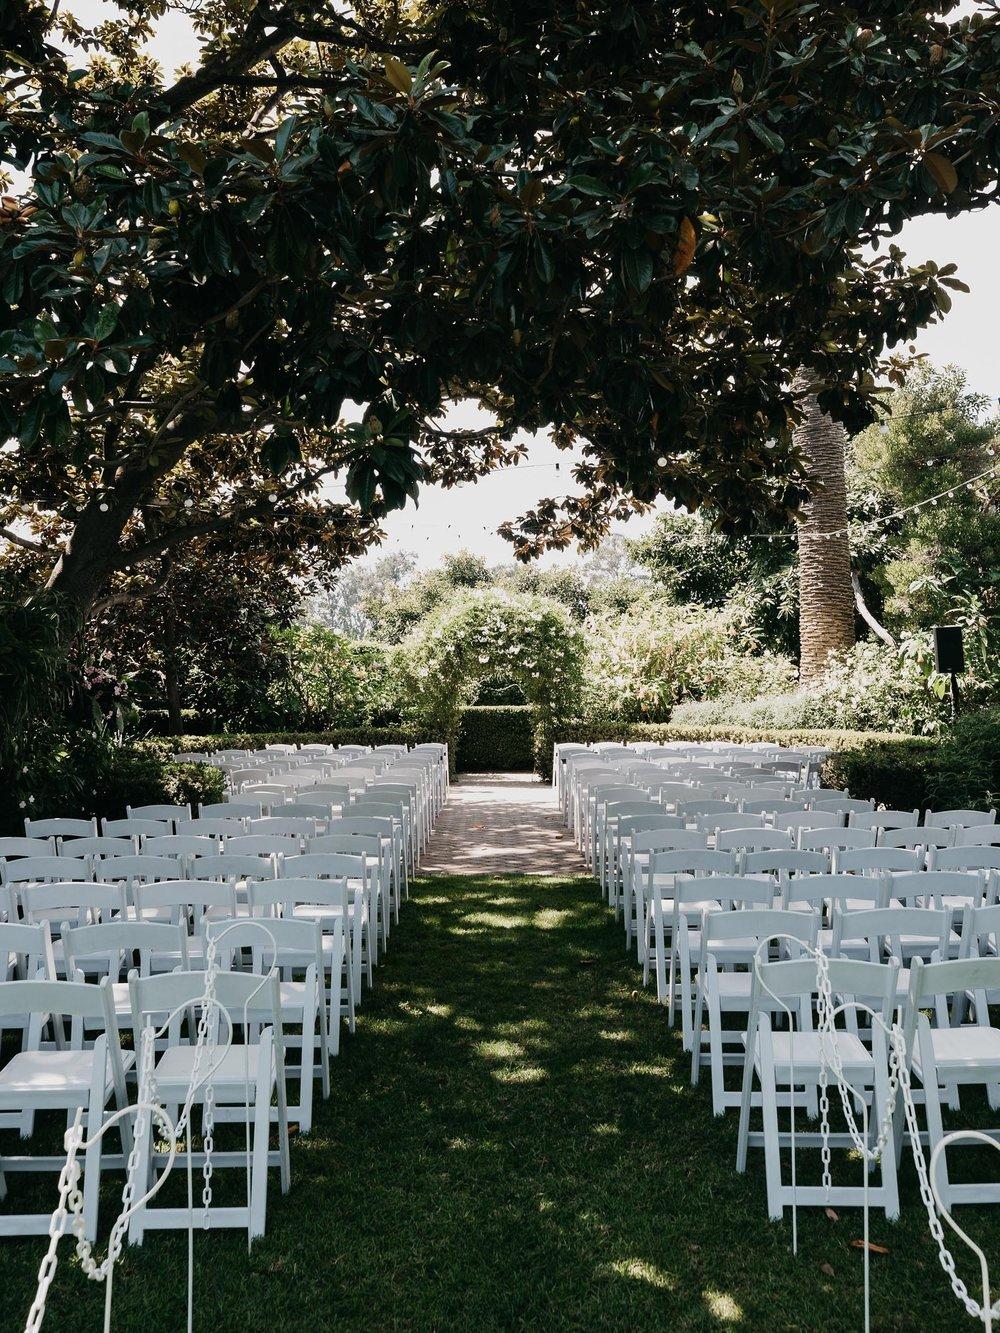 mcgrath-ranch-garden-wedding-venue-geoff-lyndsi-photography-036.jpg